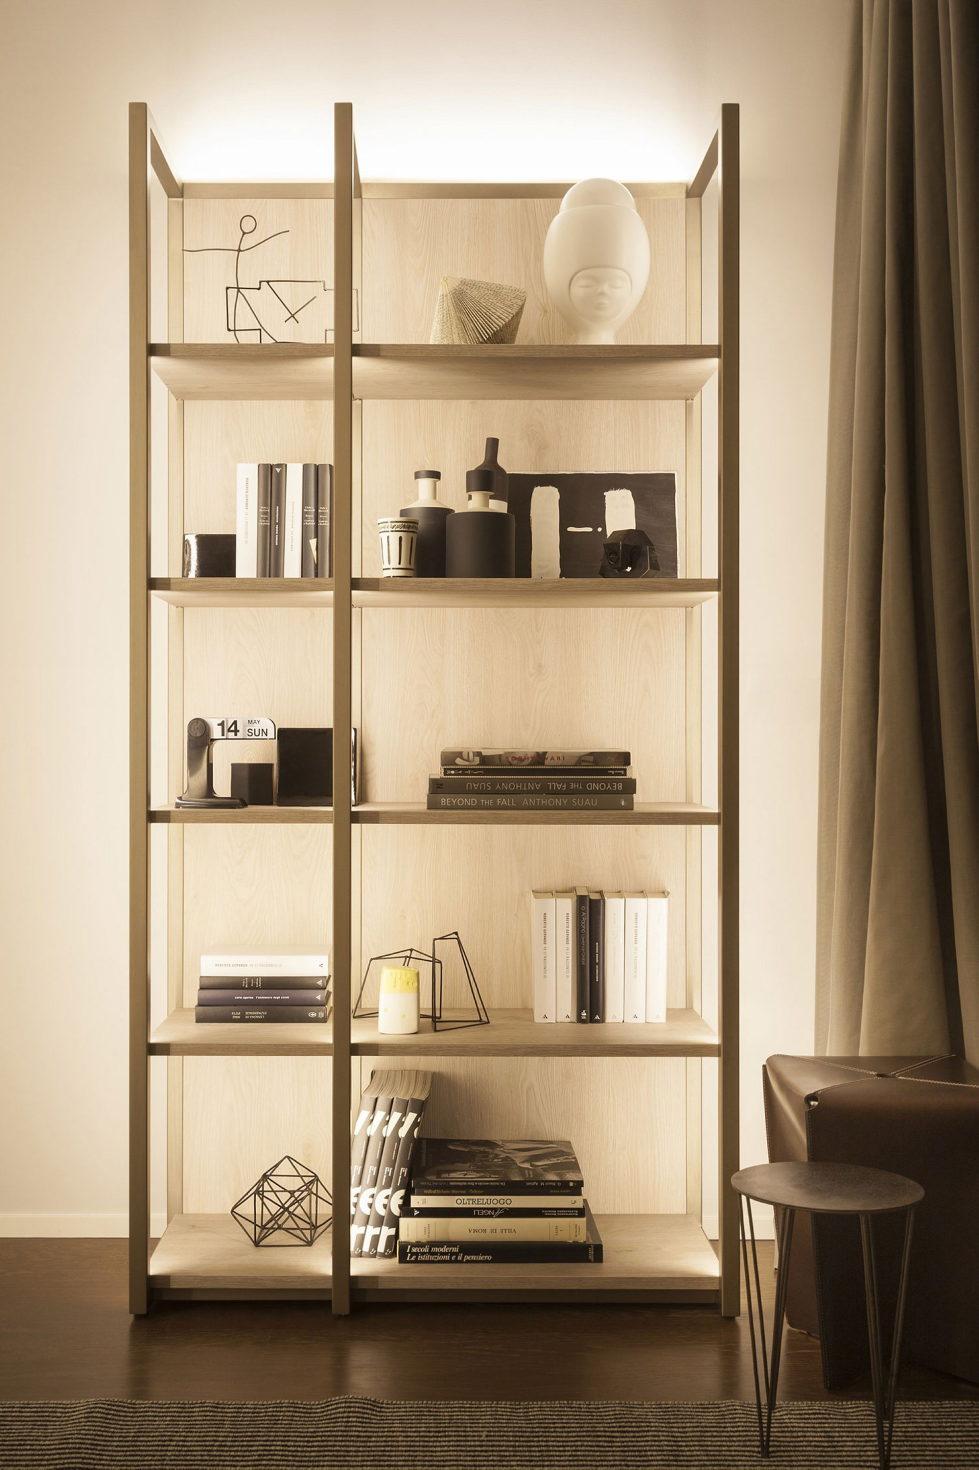 The luxury Citylife apartment from Matteo Nunziati, Milan, Italy 20